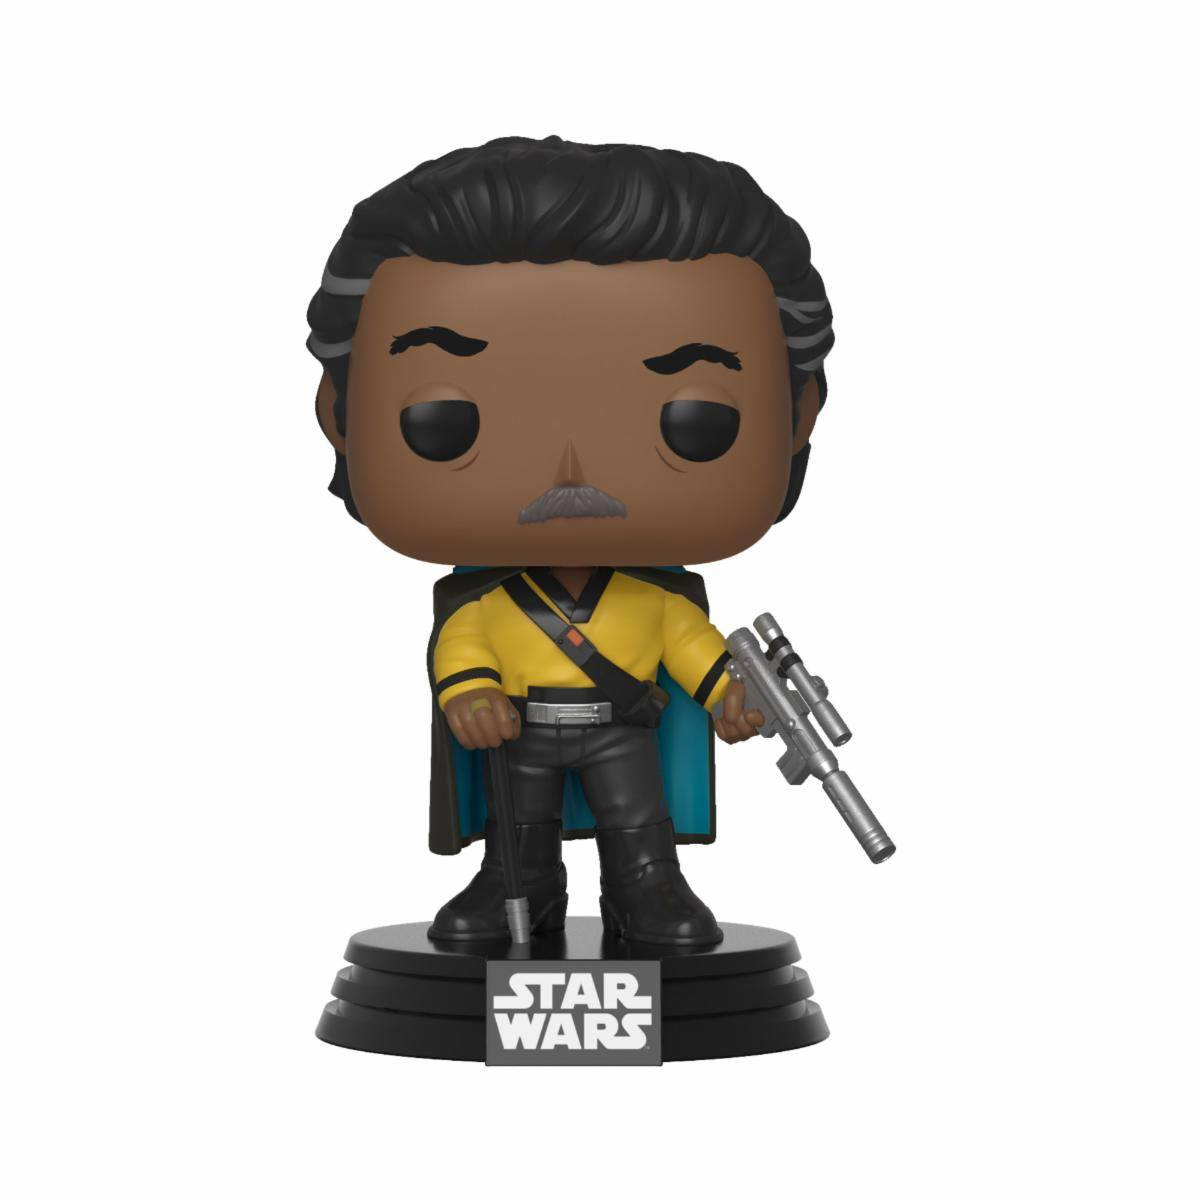 Star Wars Episode IX POP! Movies Vinyl Figure Lando Calrissian 9 cm